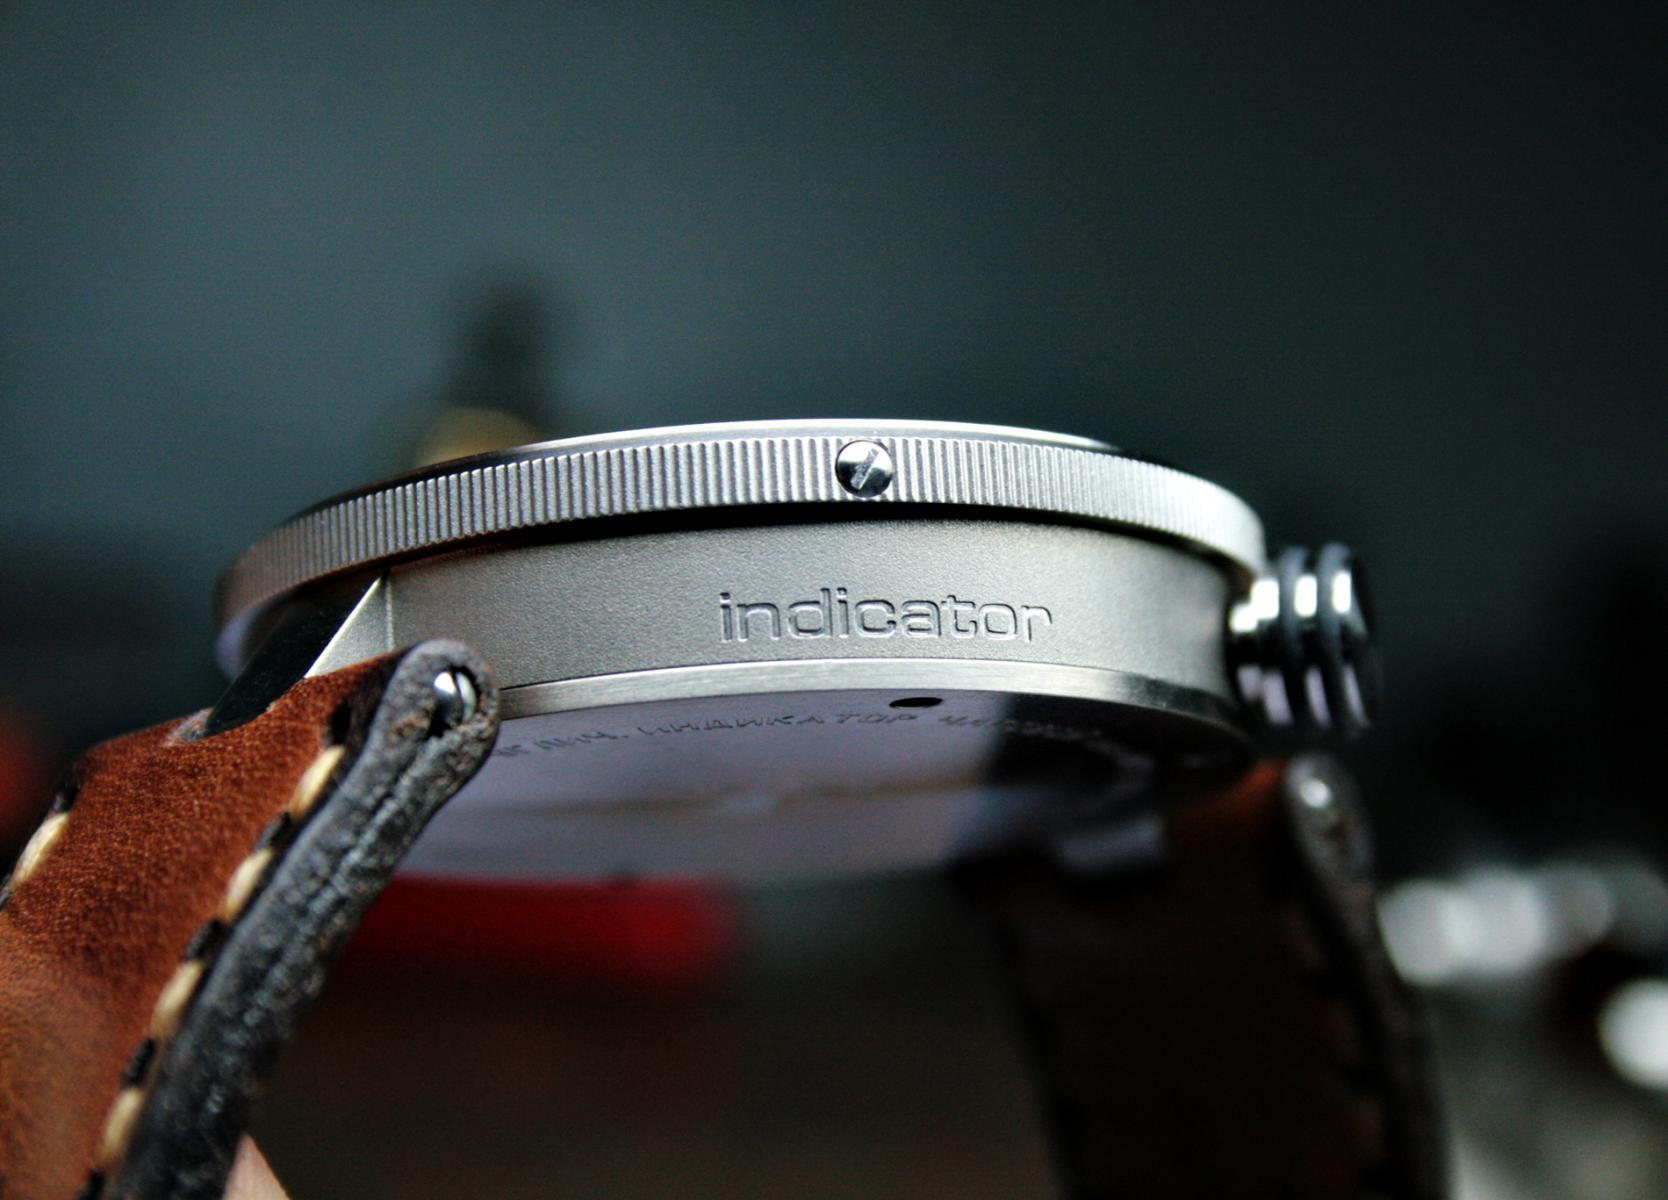 New RUSSIAN time tool INDICATOR-img_7575.jpg